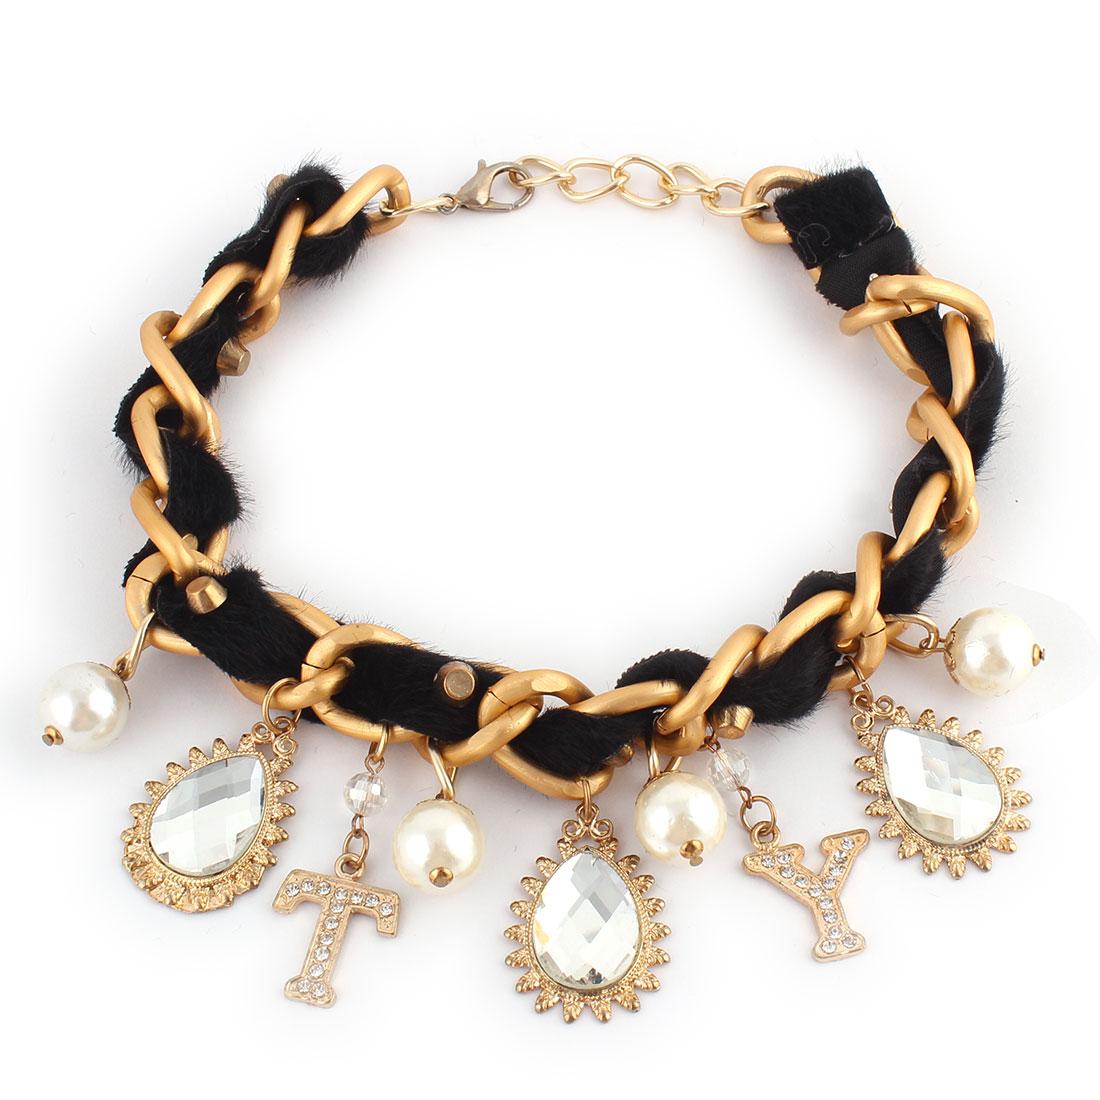 Rhinestone Imitation Pearl Pendant Necklace Banquet Party Clothes Ornament